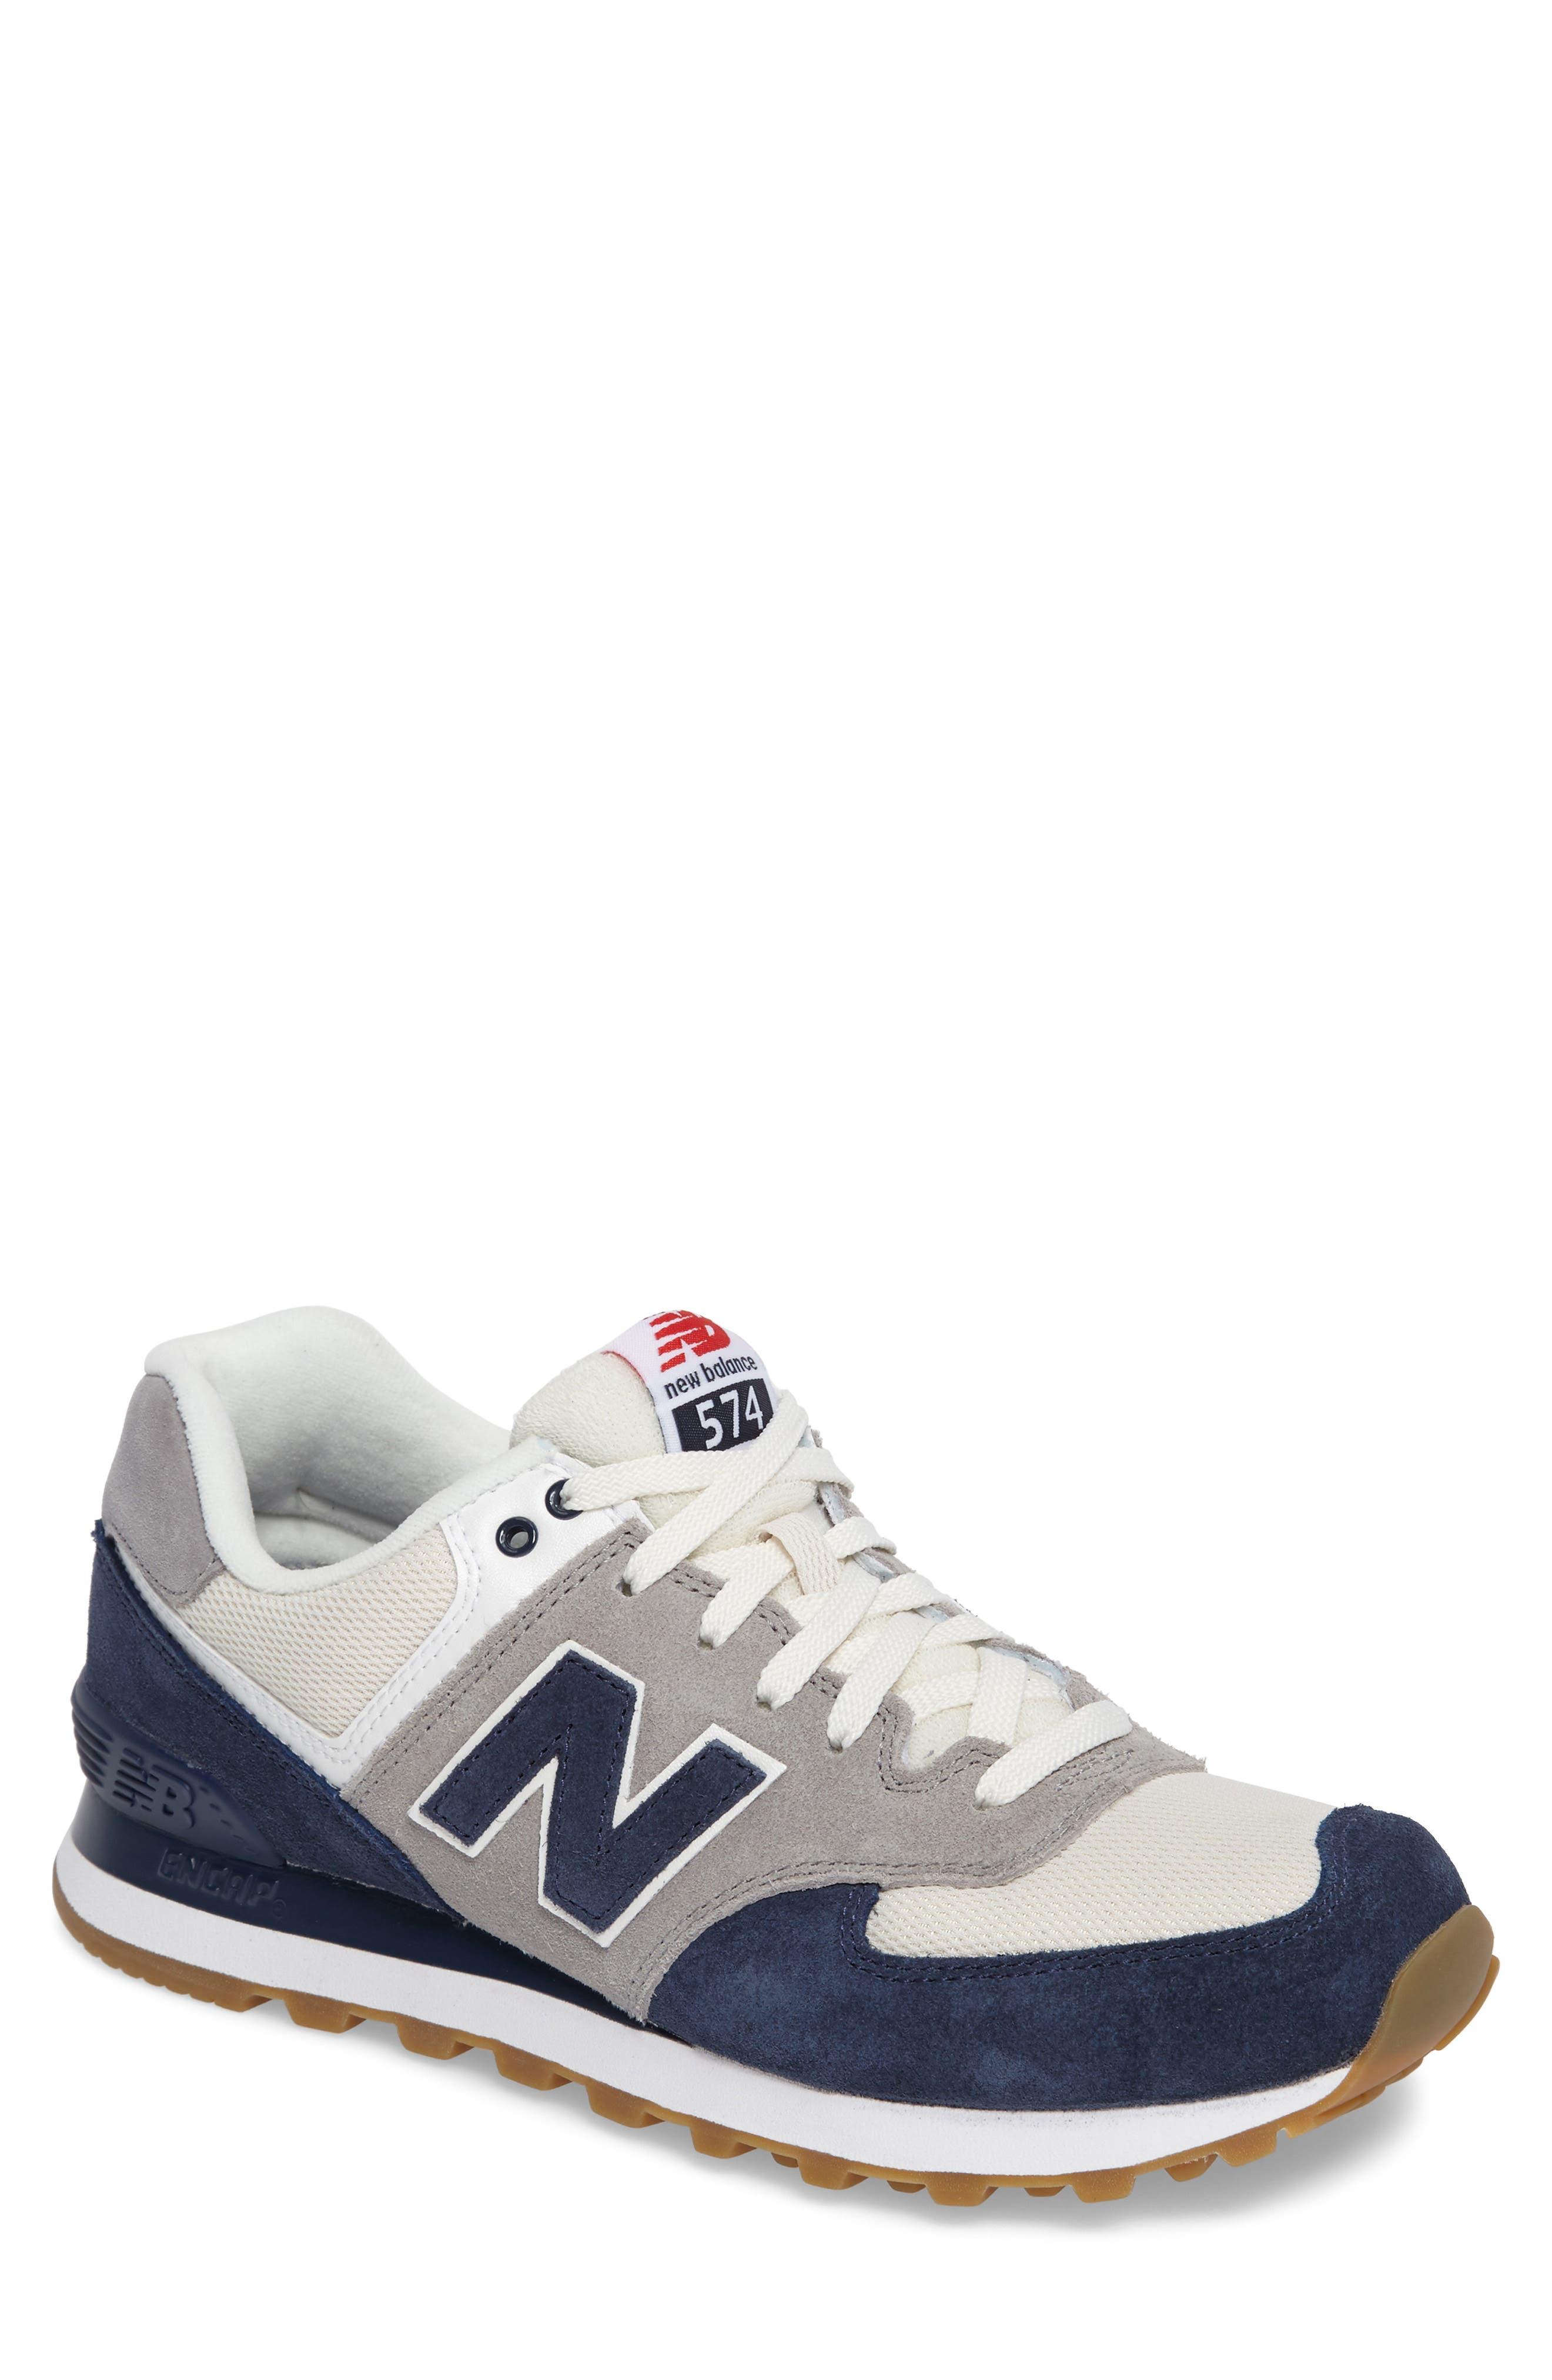 574 Retro Sport Sneaker,                         Main,                         color, Electric Blue